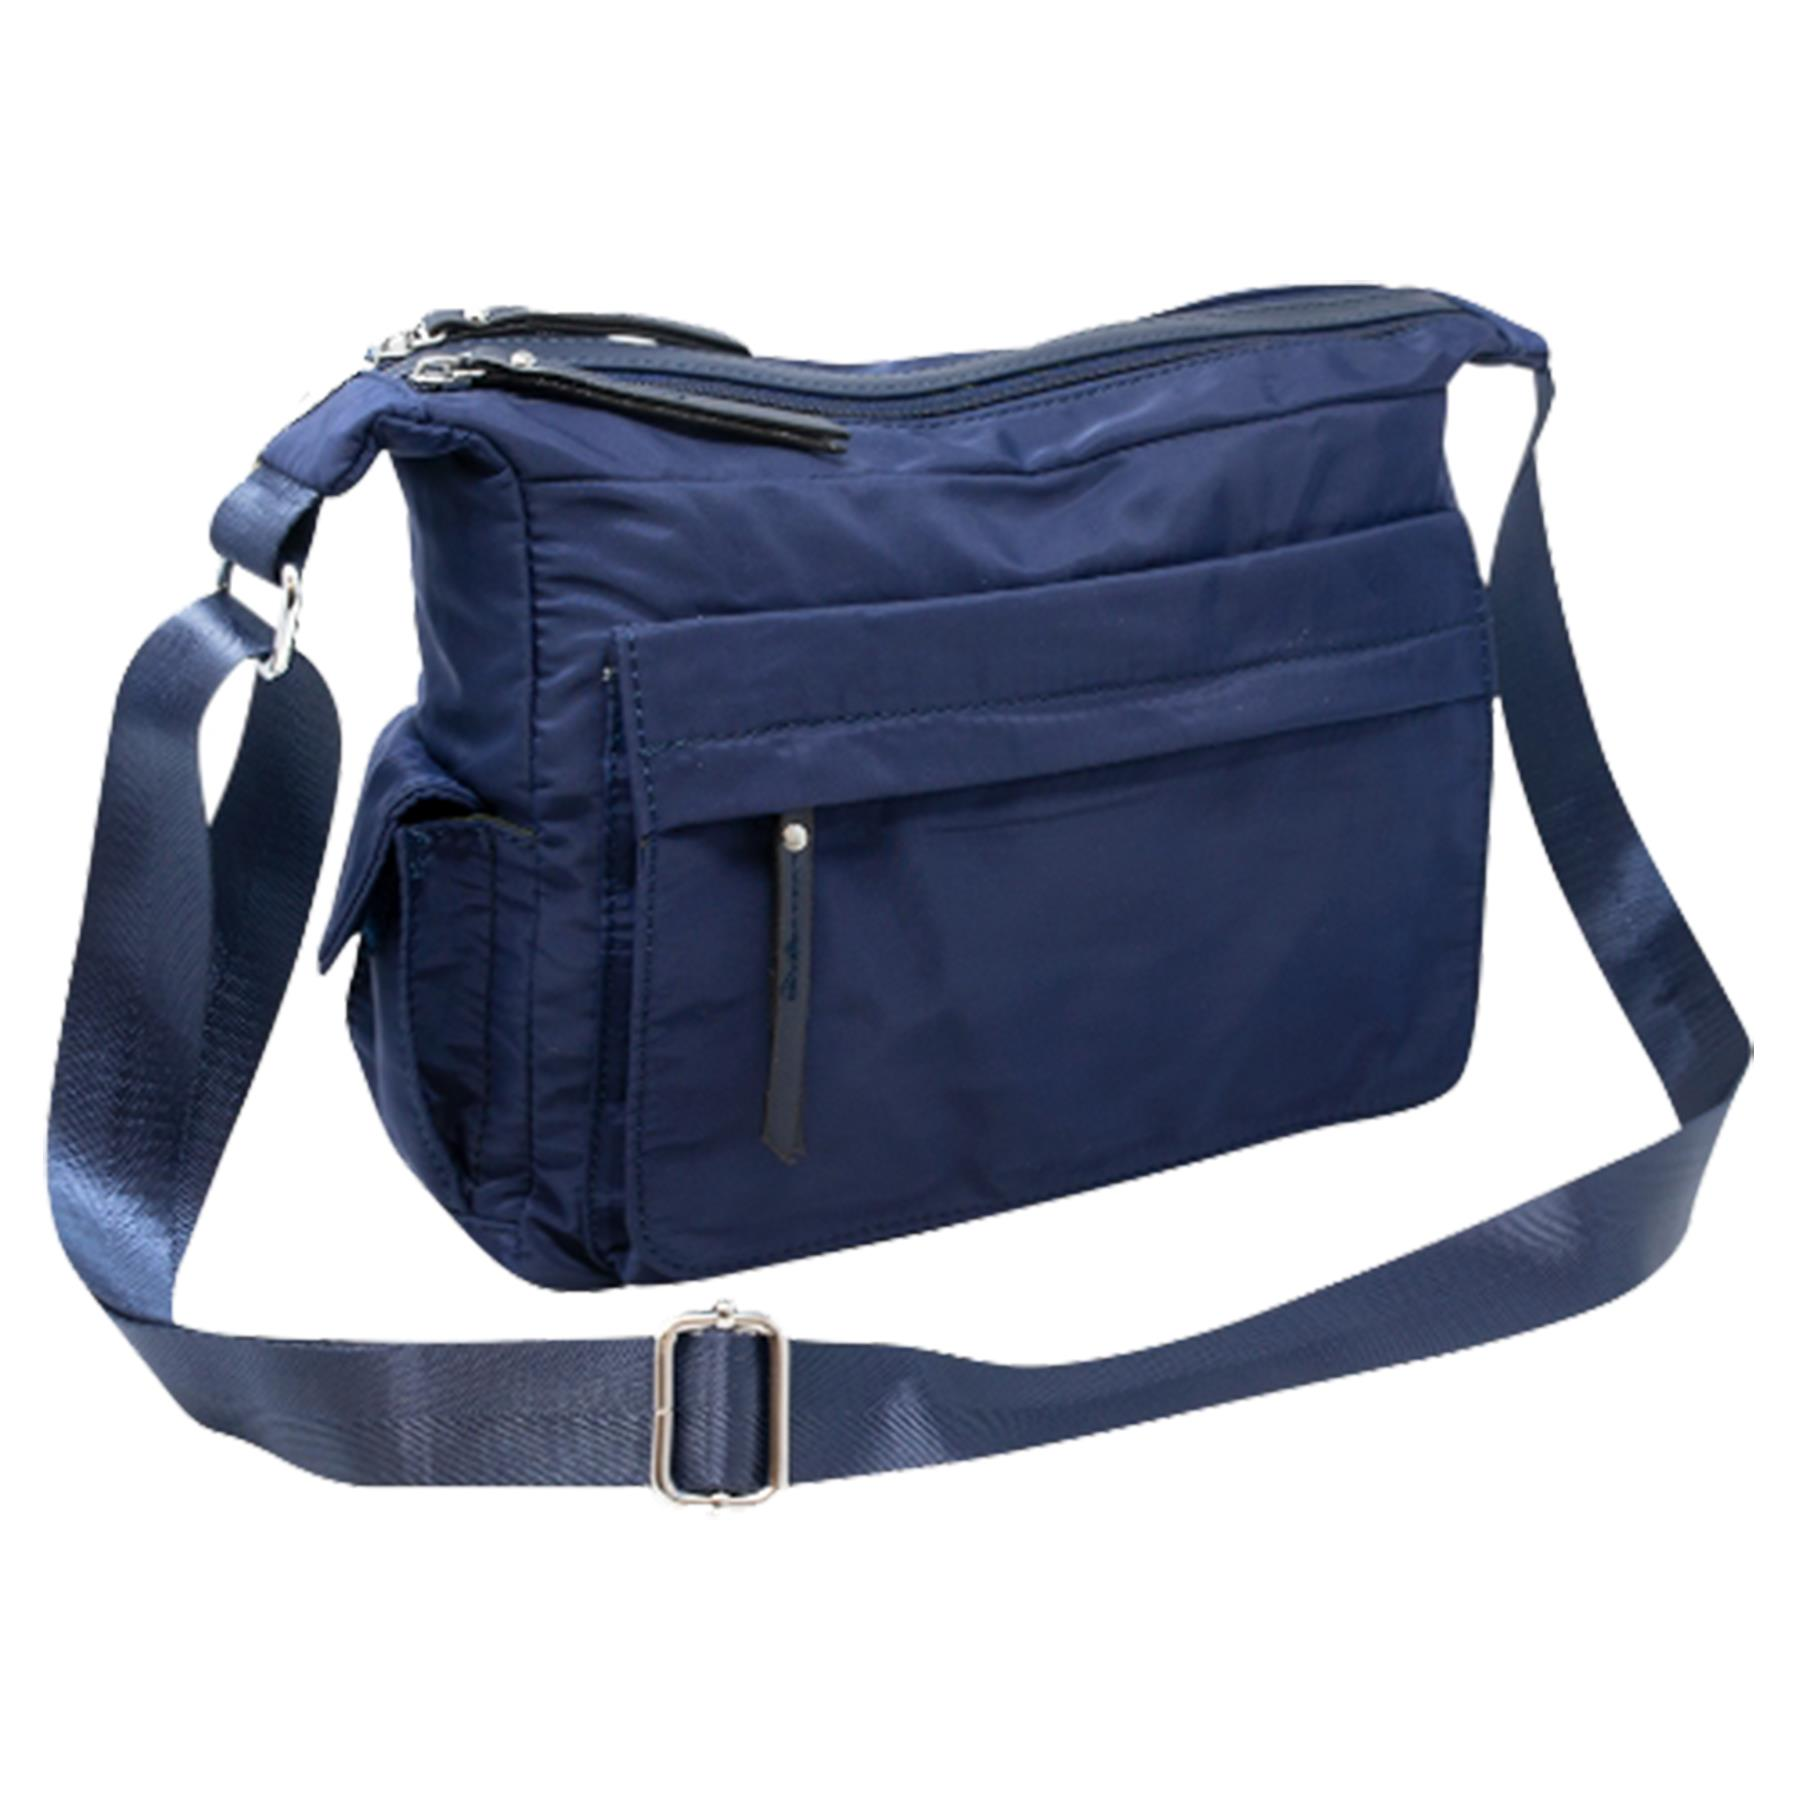 New-Ladies-Men-s-Showerproof-School-College-Practical-Basic-Crossbody-Bag thumbnail 13